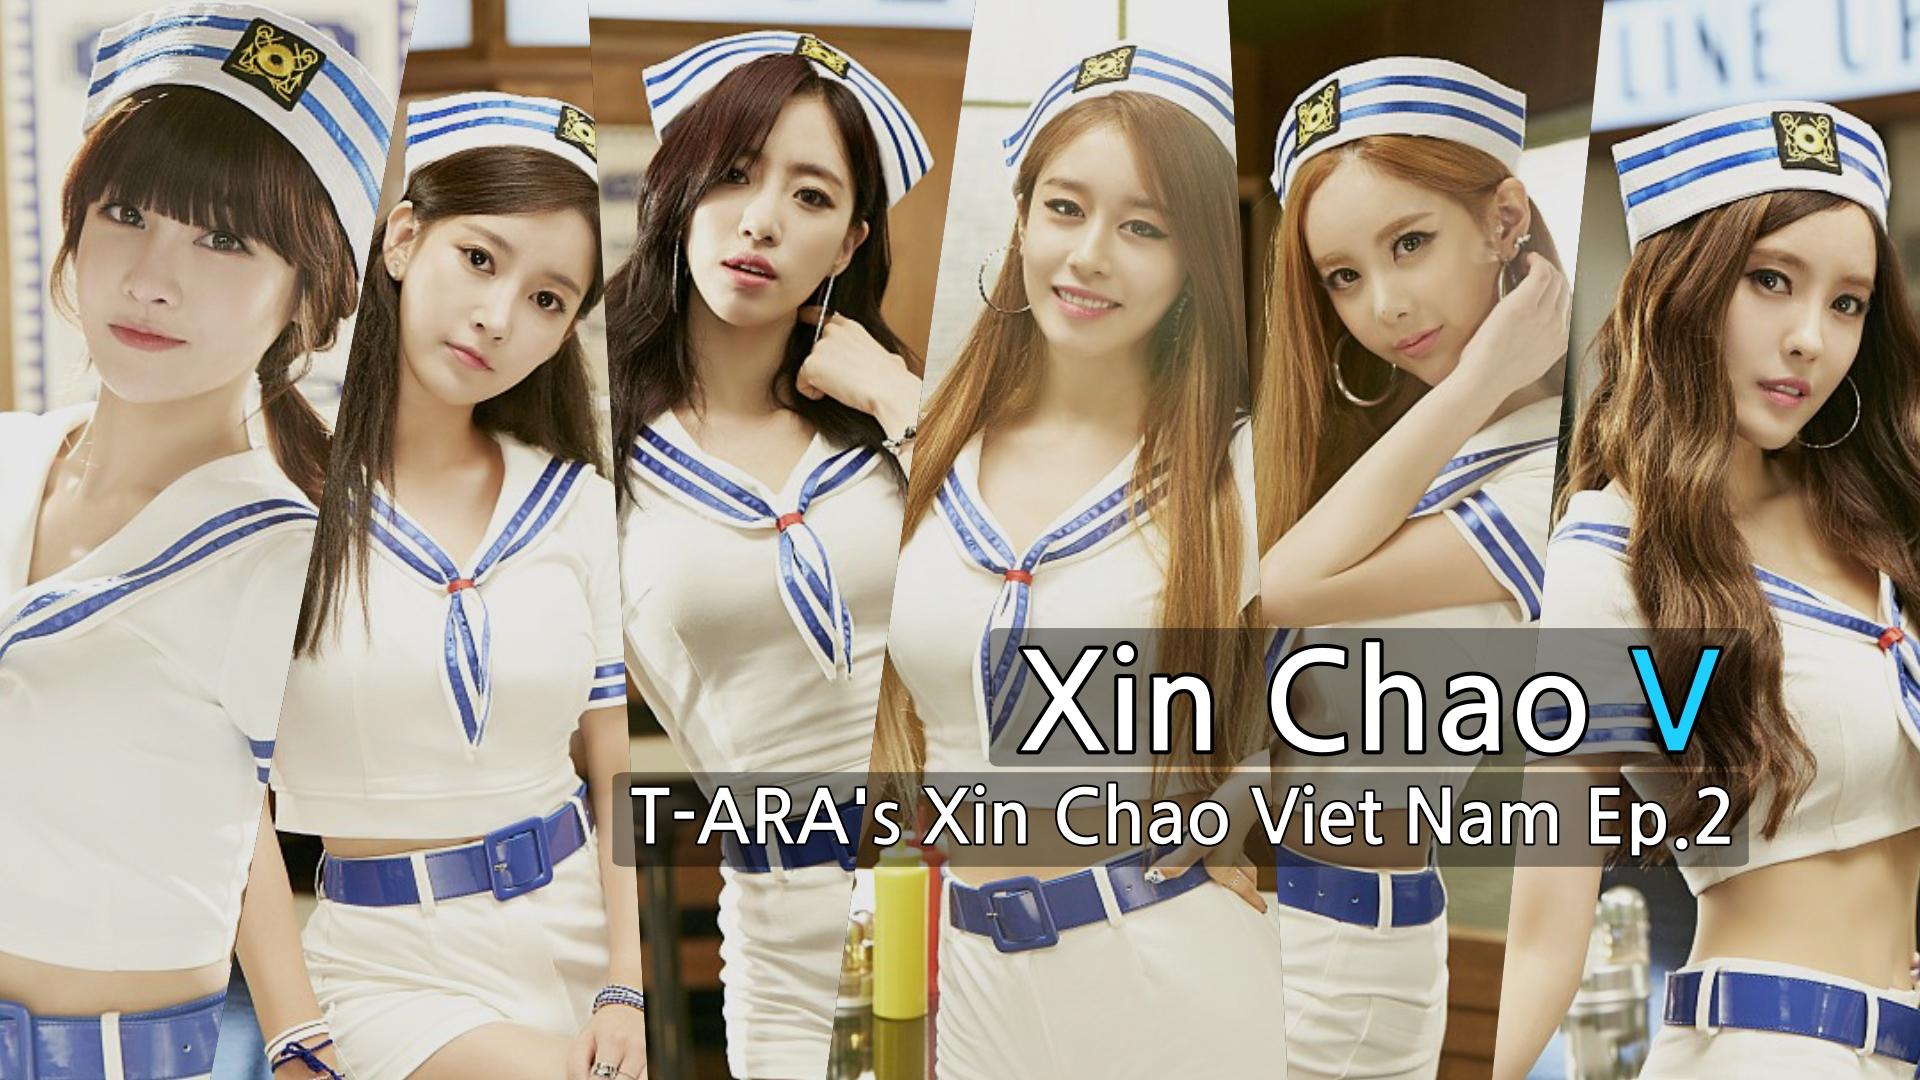 T-ARA's Xin Chao Viet Nam Ep.2